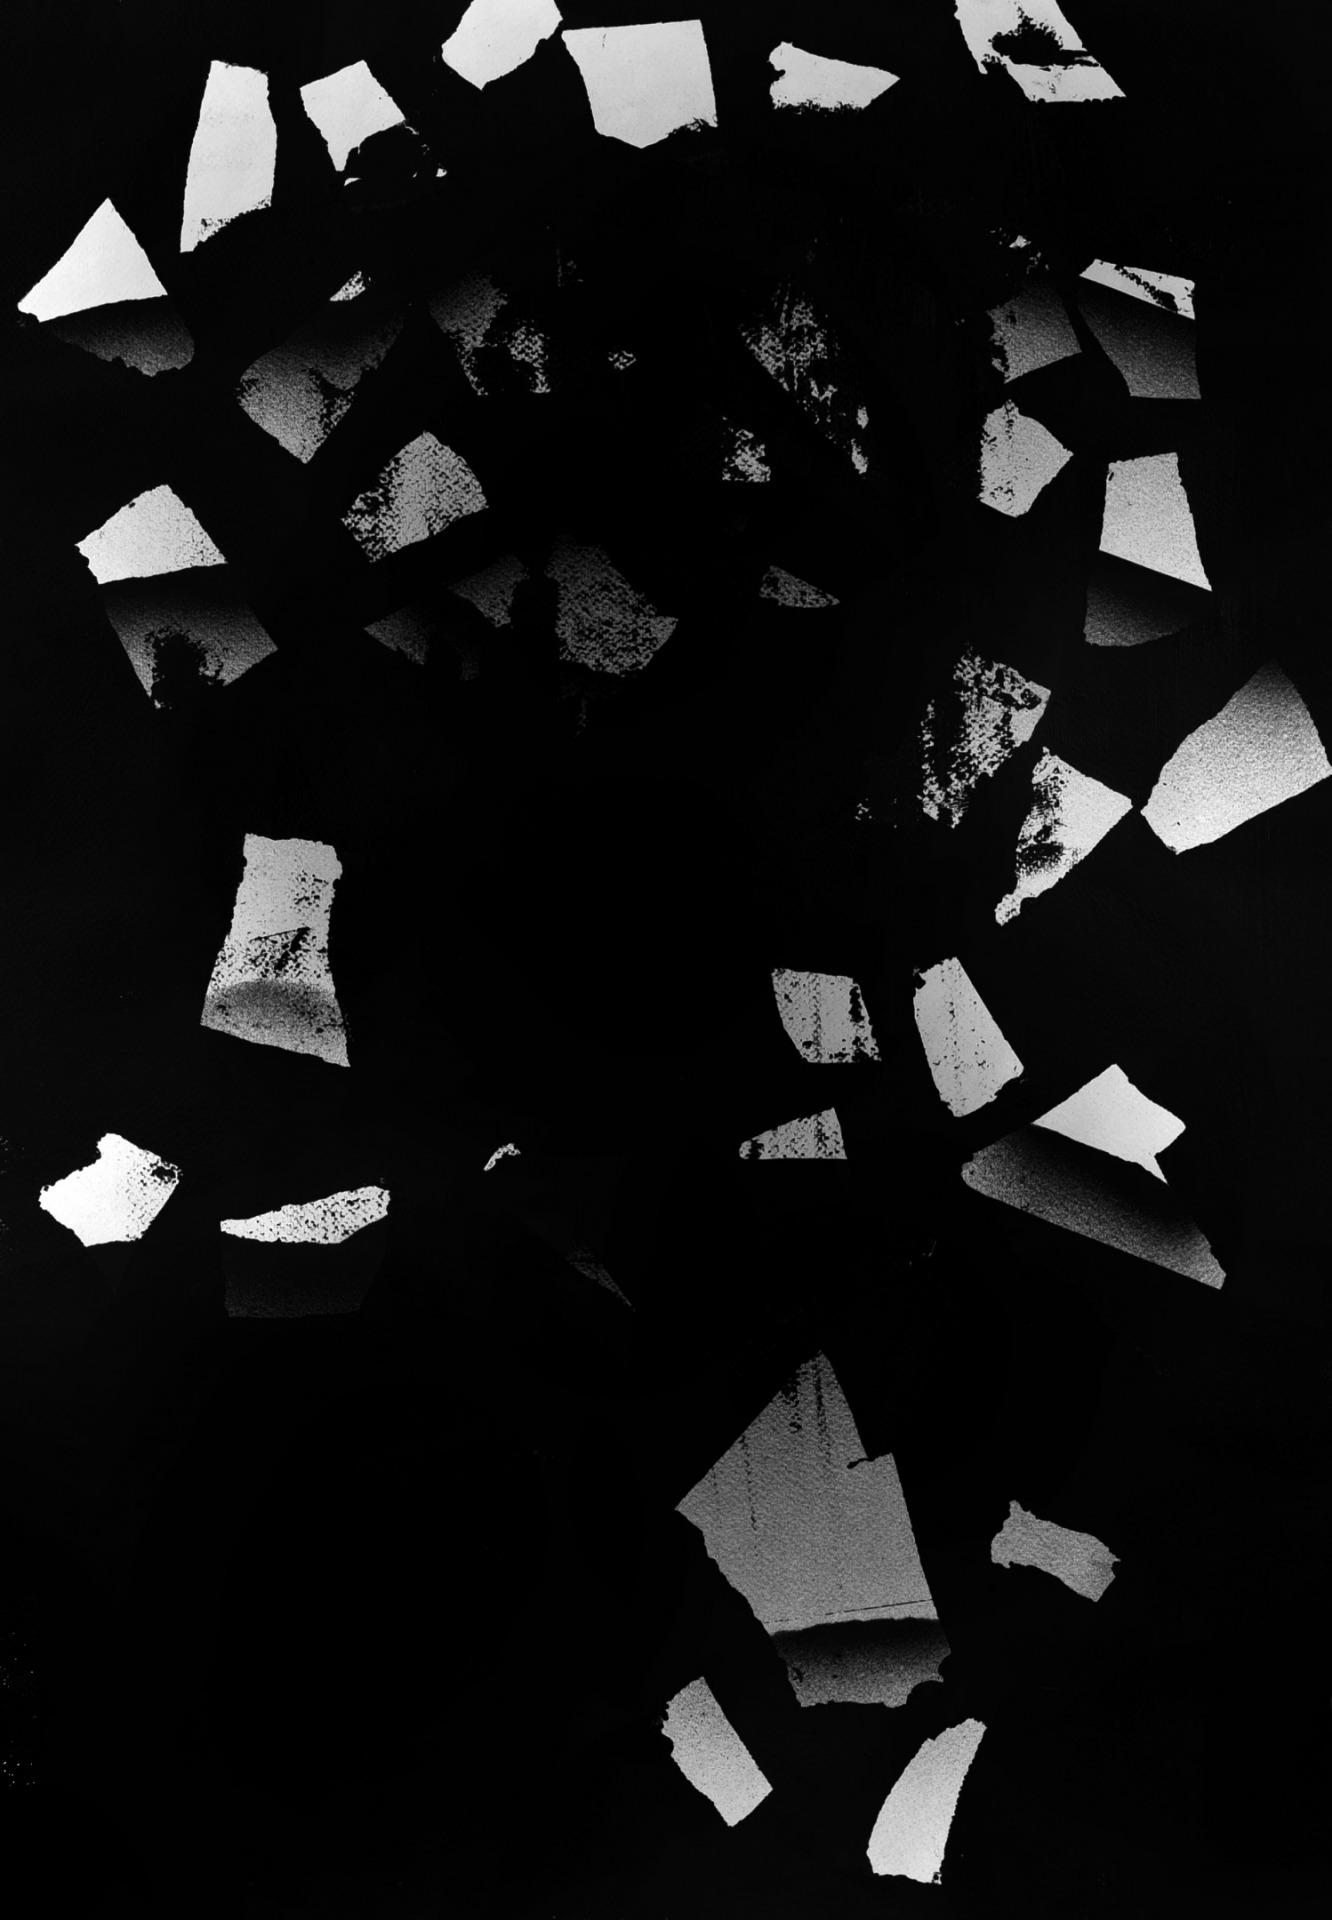 Contemporary art from Gyula Sági | op090321. 9